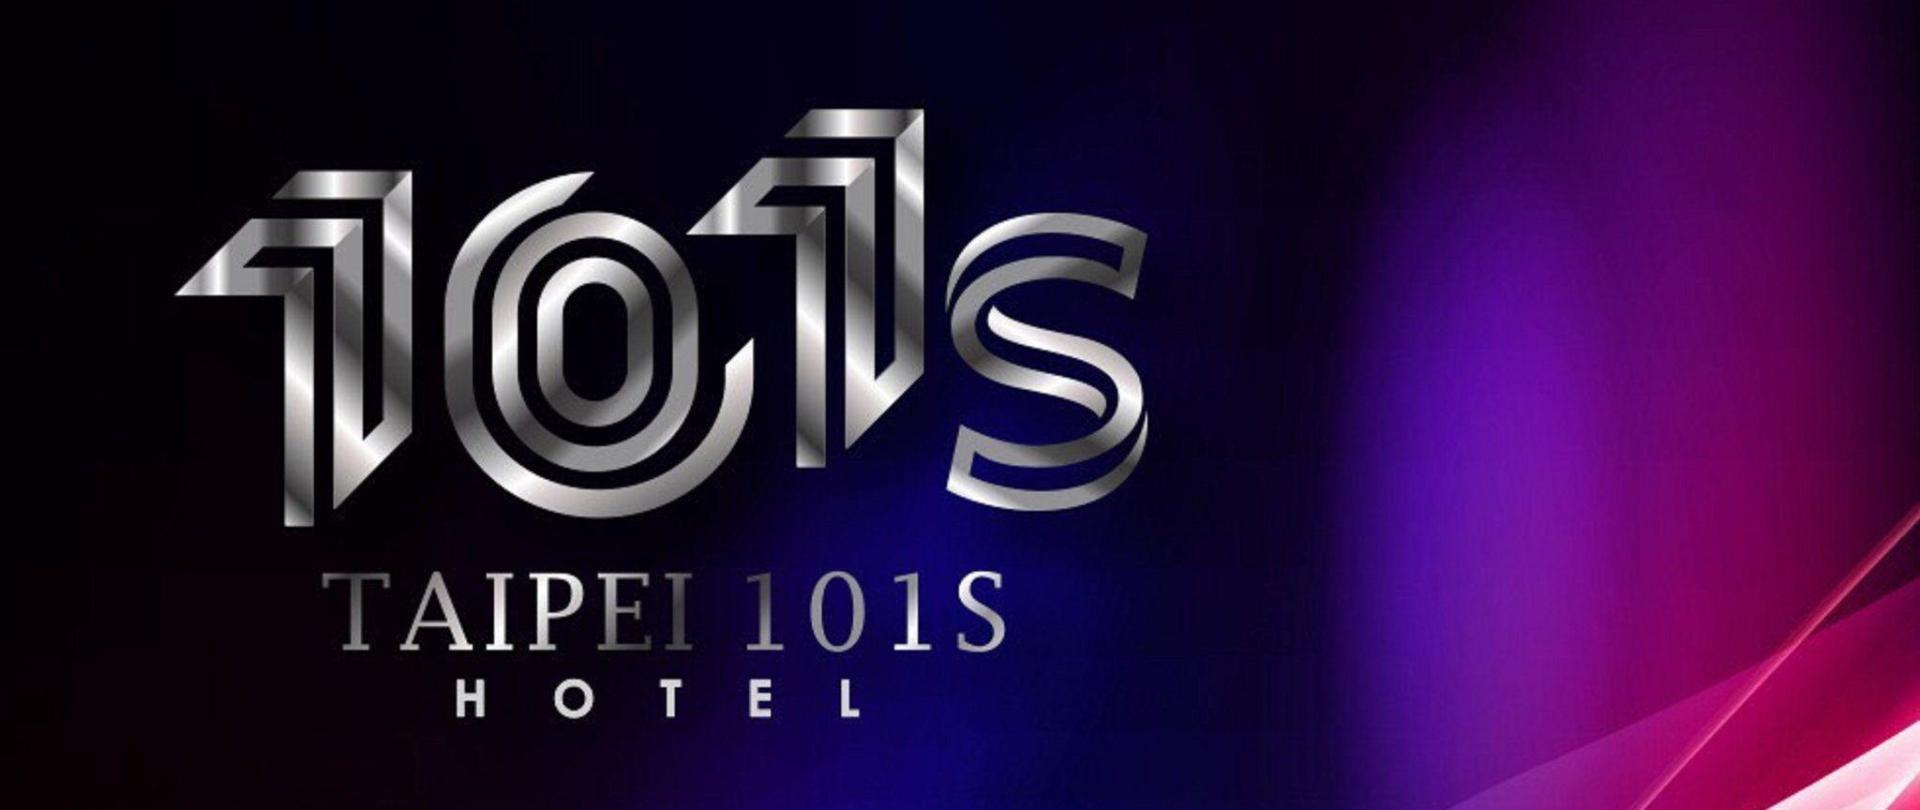 logo-1-1.jpg